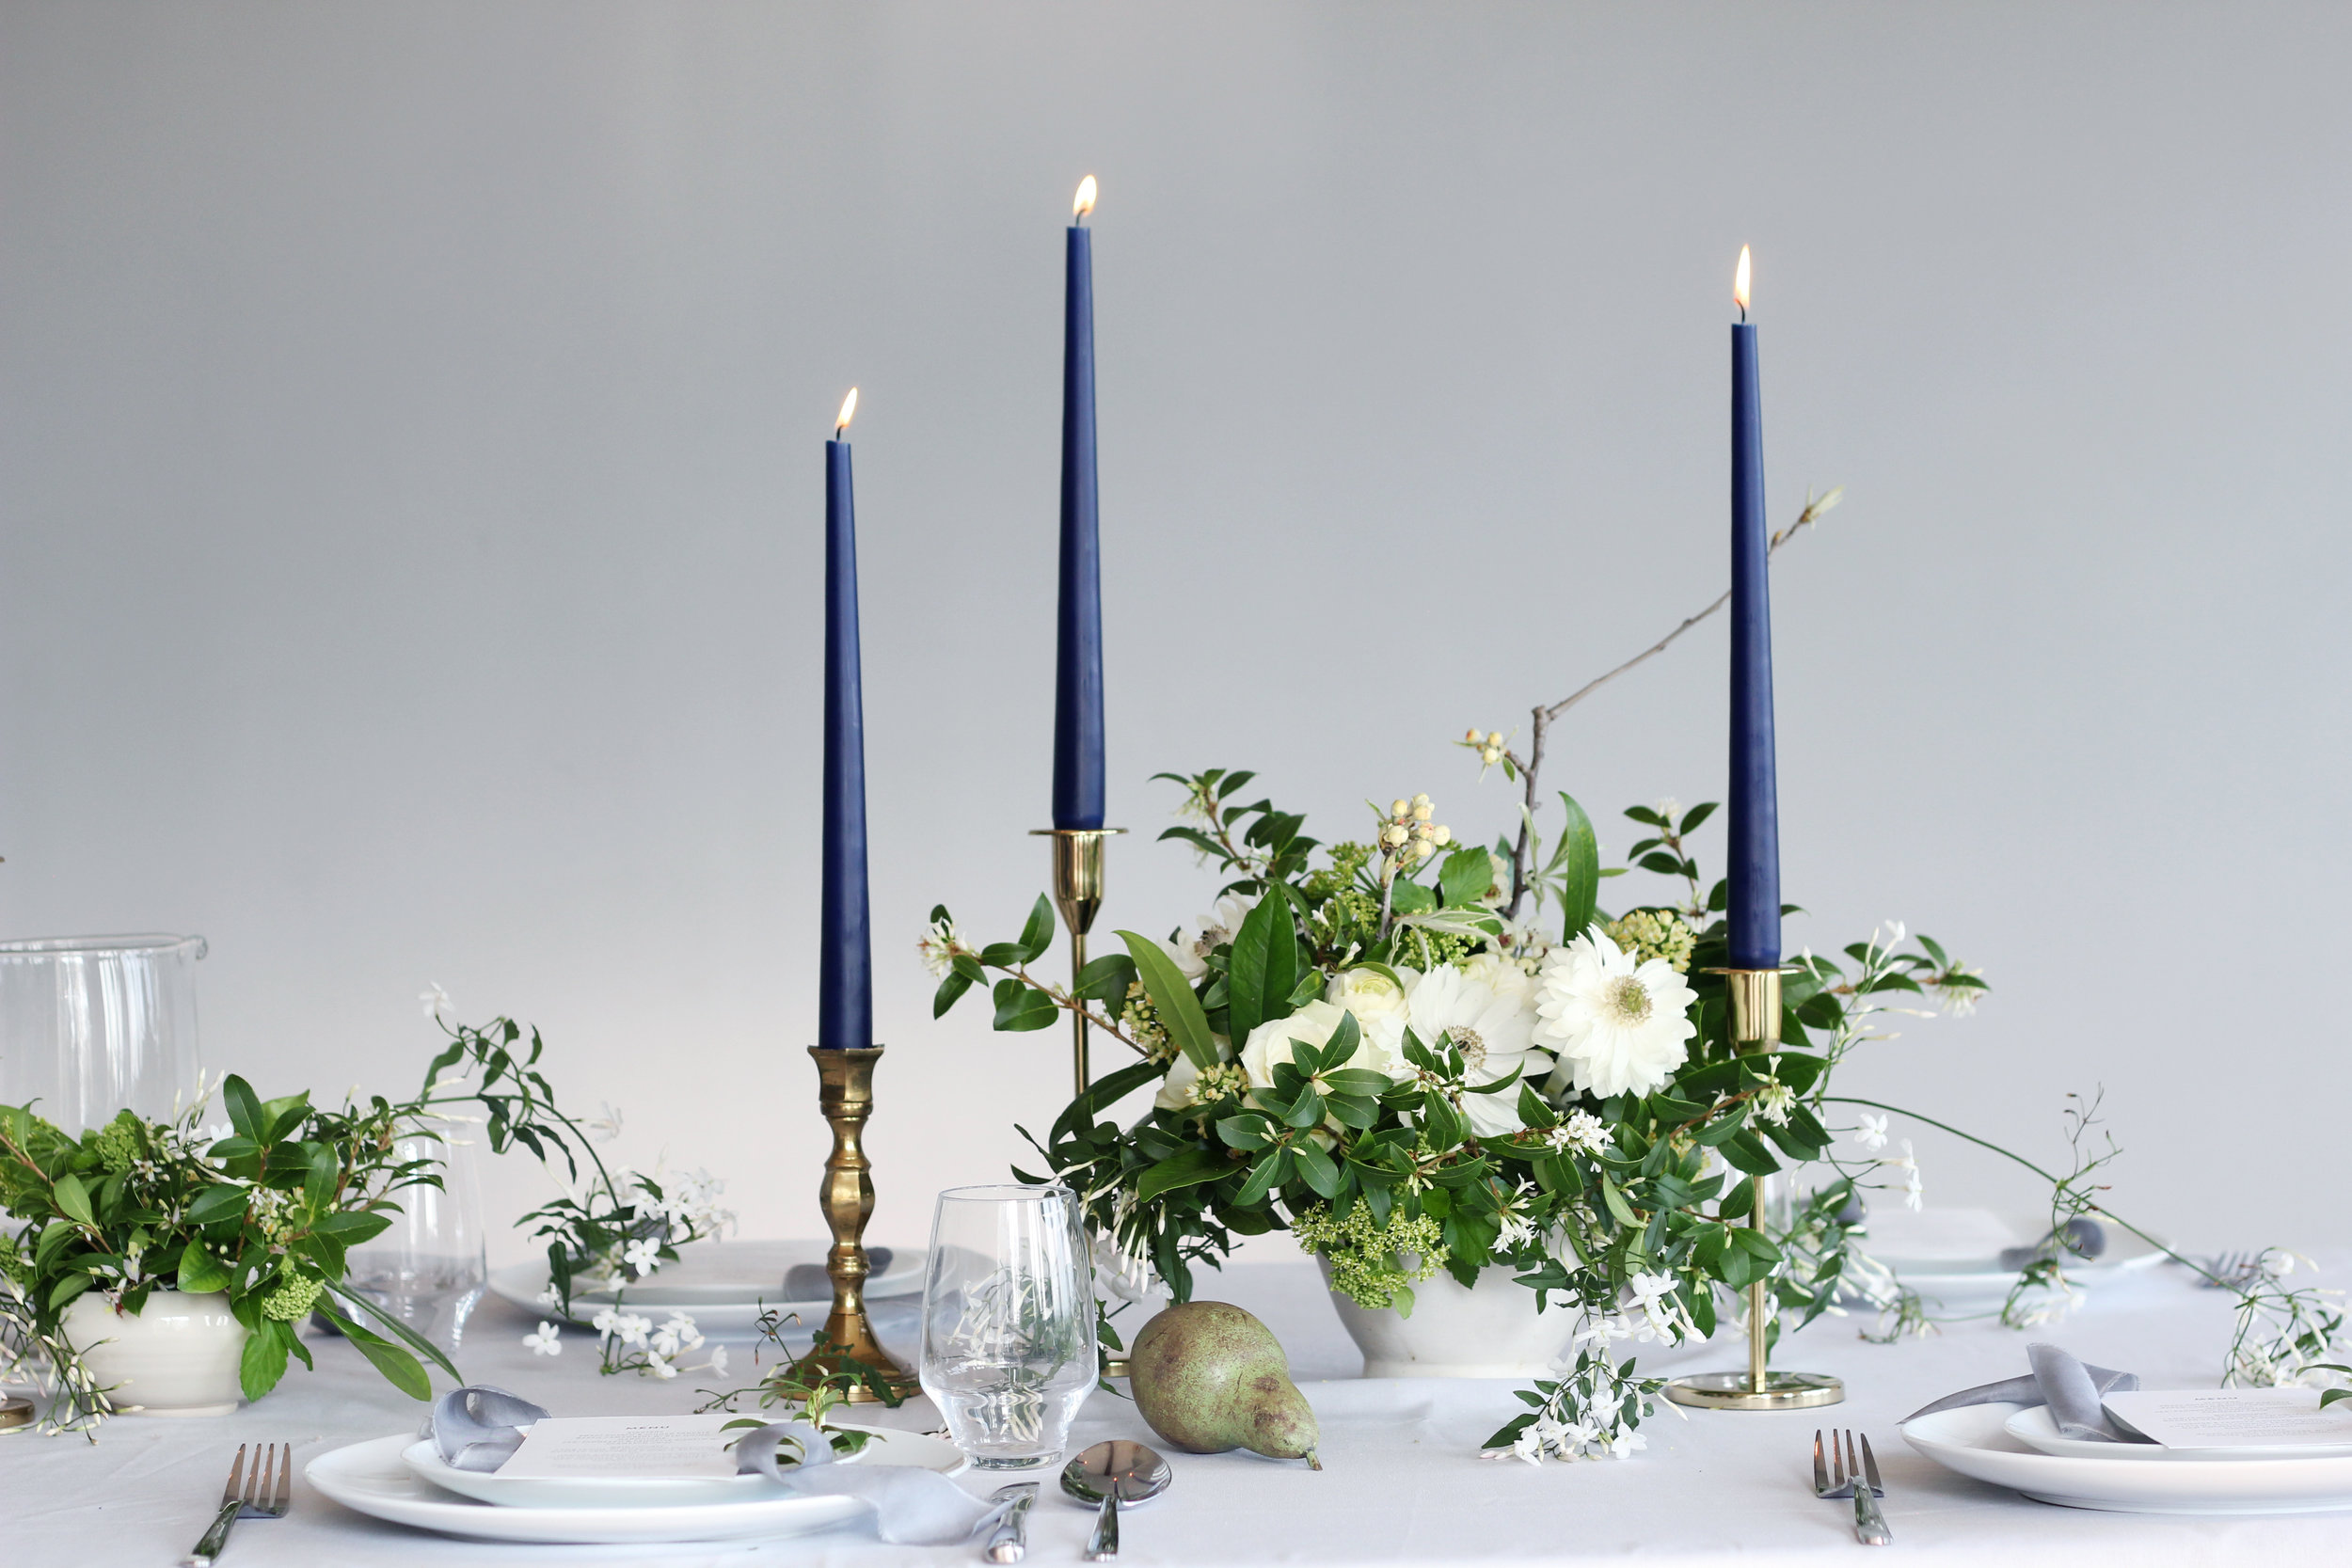 Callie-Pettigrew-Dusky-Blue-Wedding-7.jpg